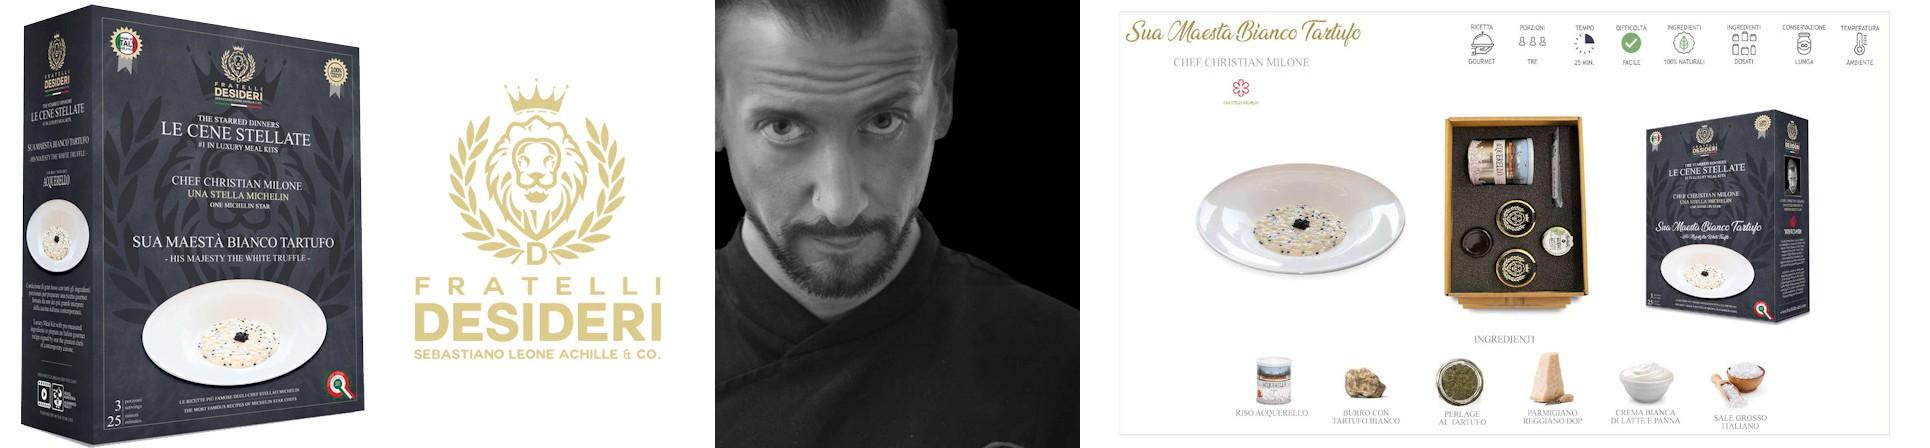 Cene stellate vendita online -chef Christian Milone 1 stella Michelin